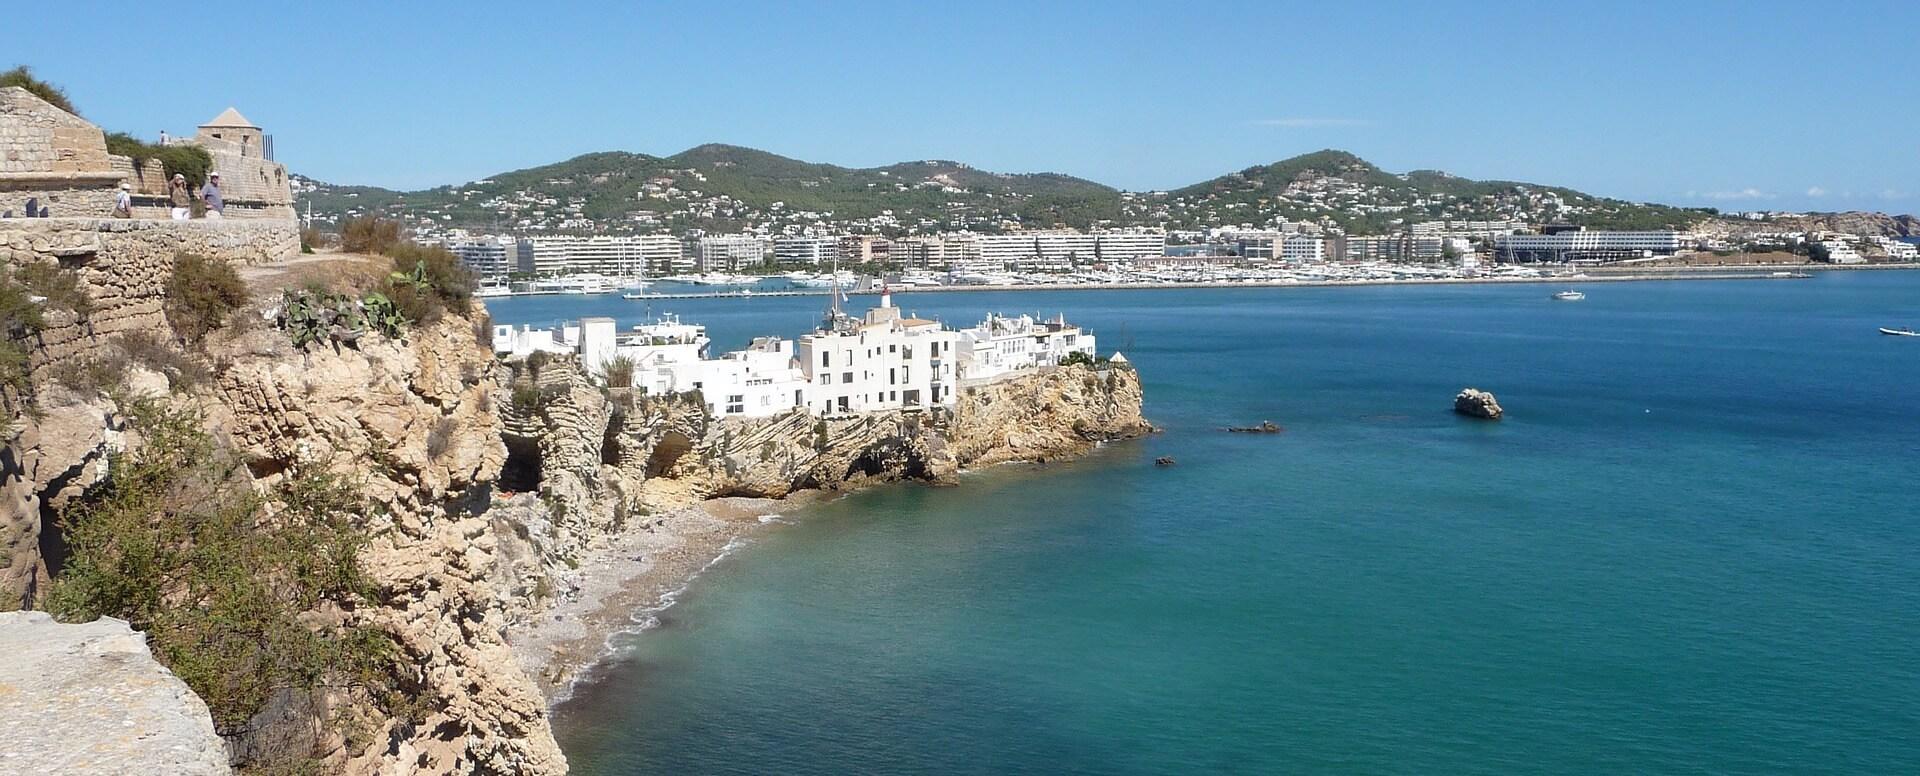 10 things to do in Ibiza - Ibiza